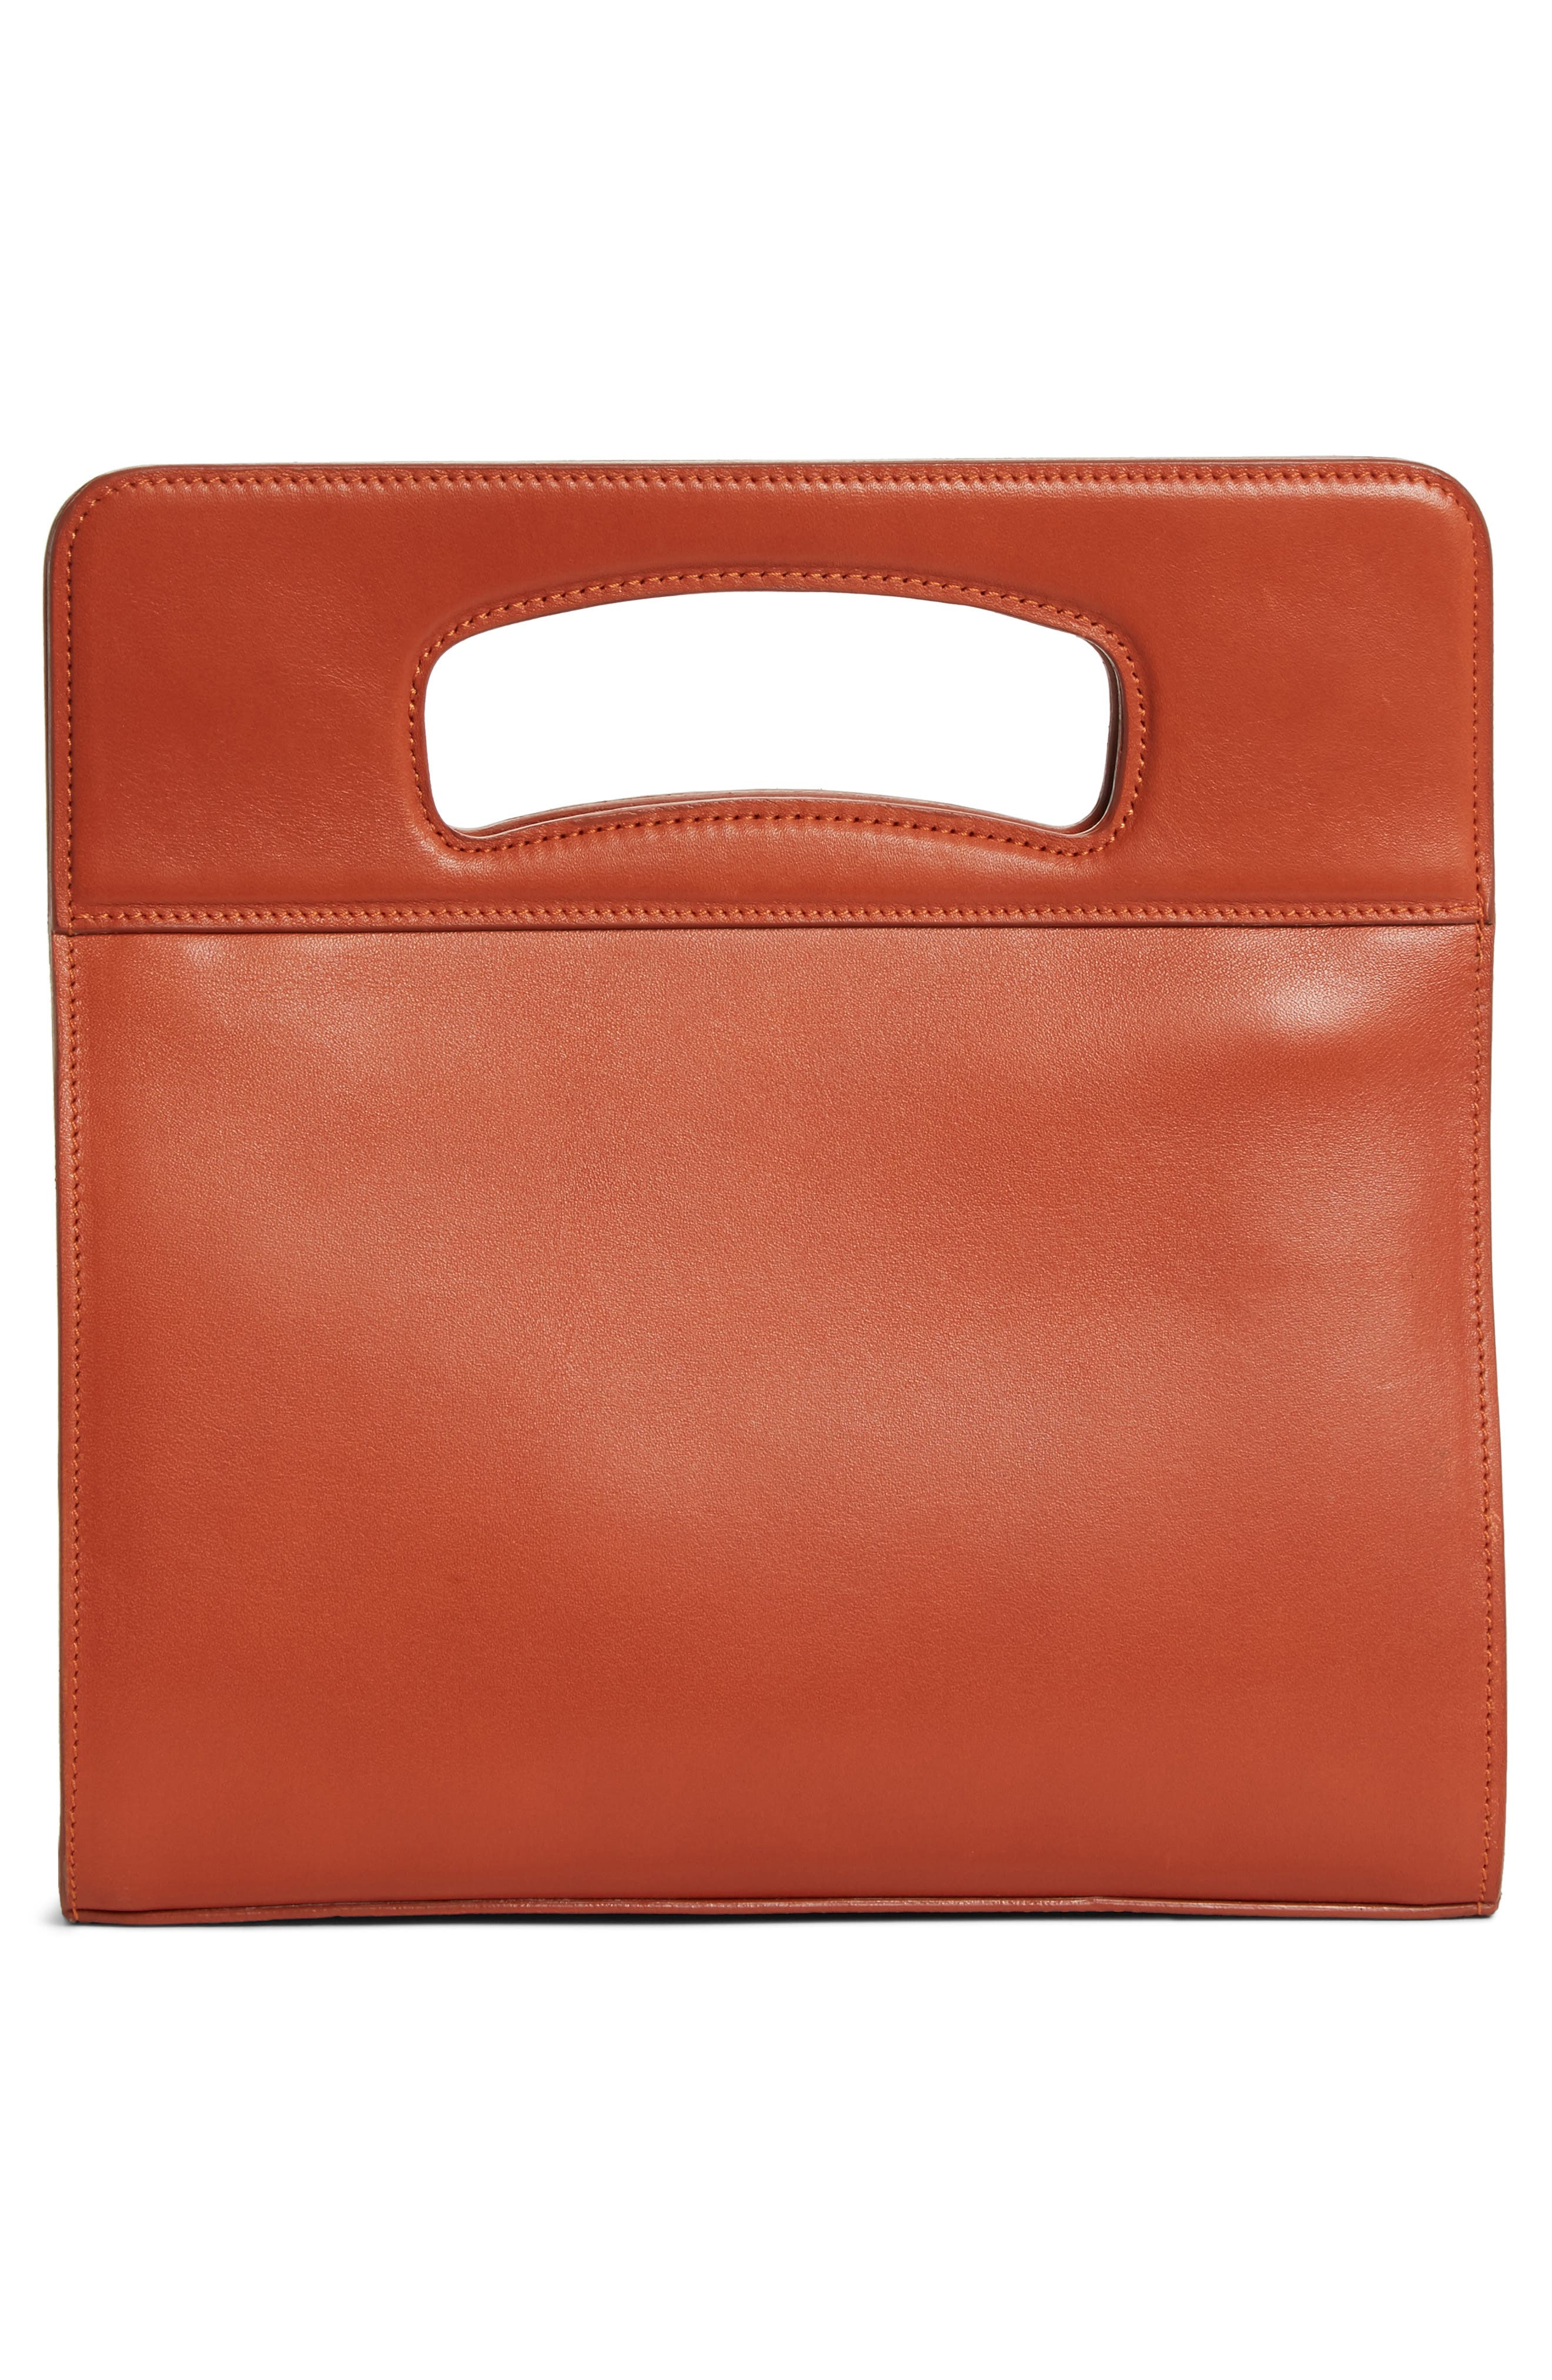 Gilda Crossbody Bag,                             Alternate thumbnail 3, color,                             200